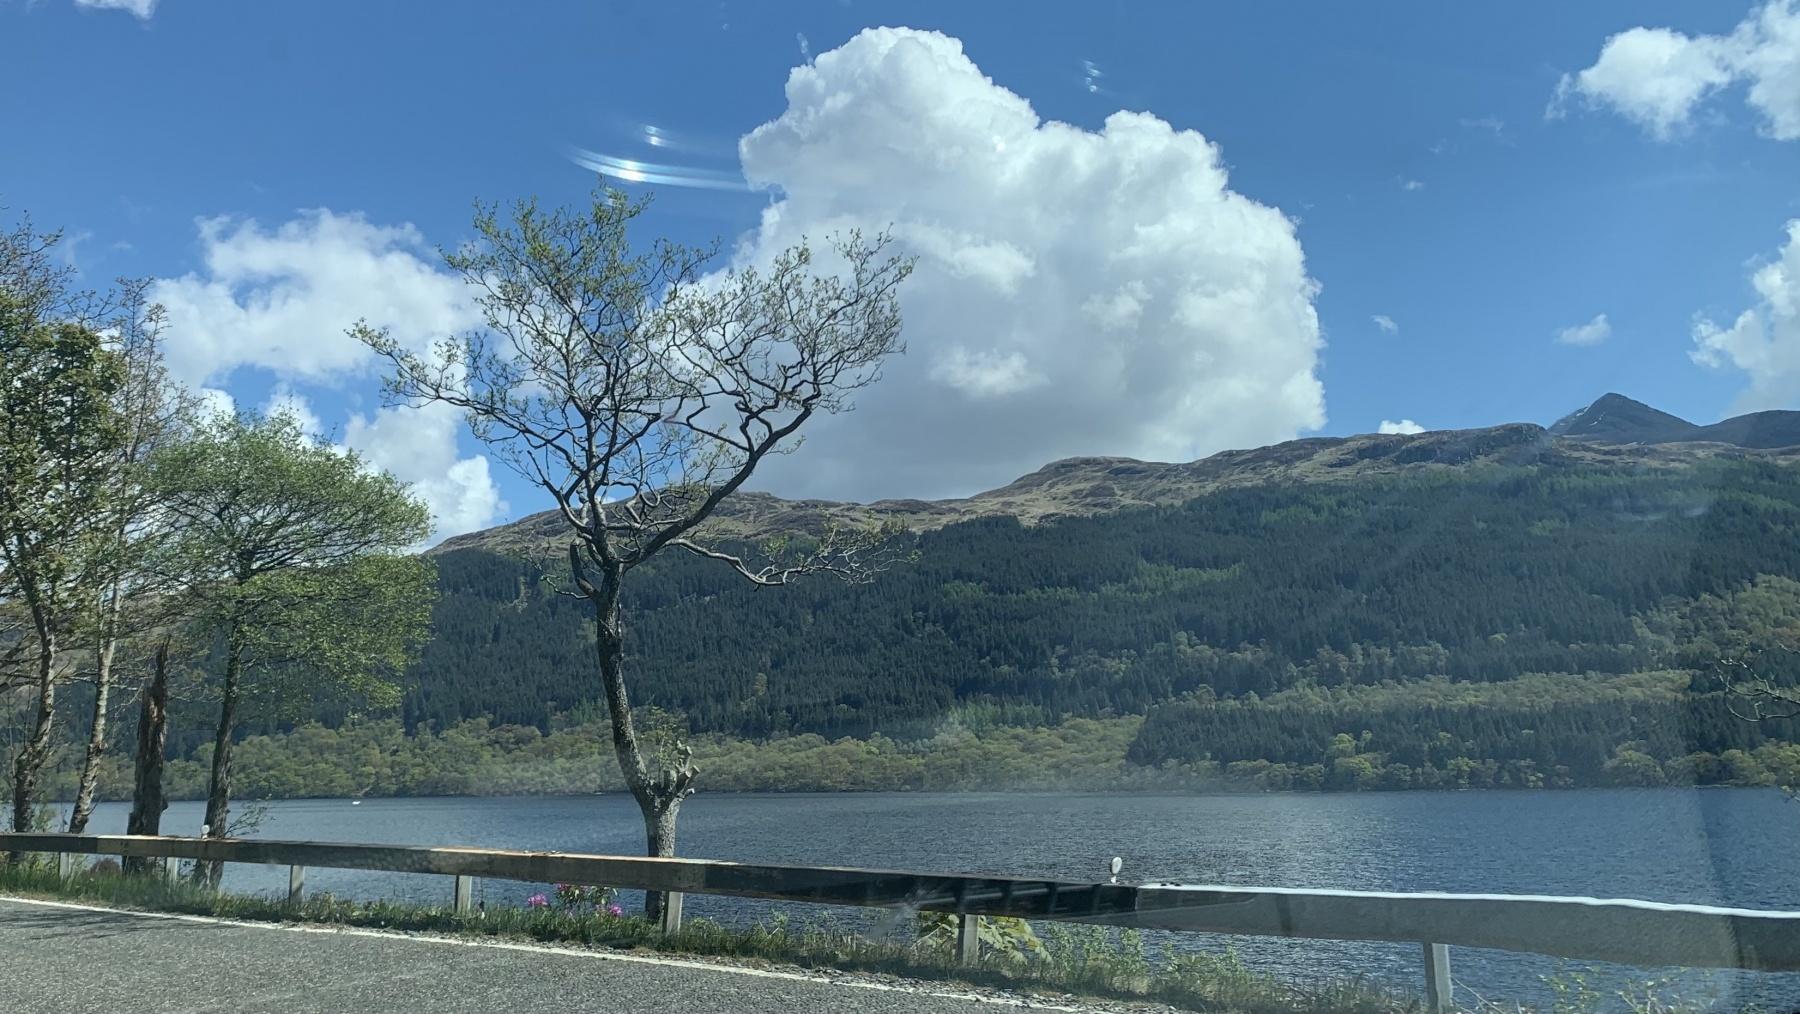 Loch Lomond & The Trossachs